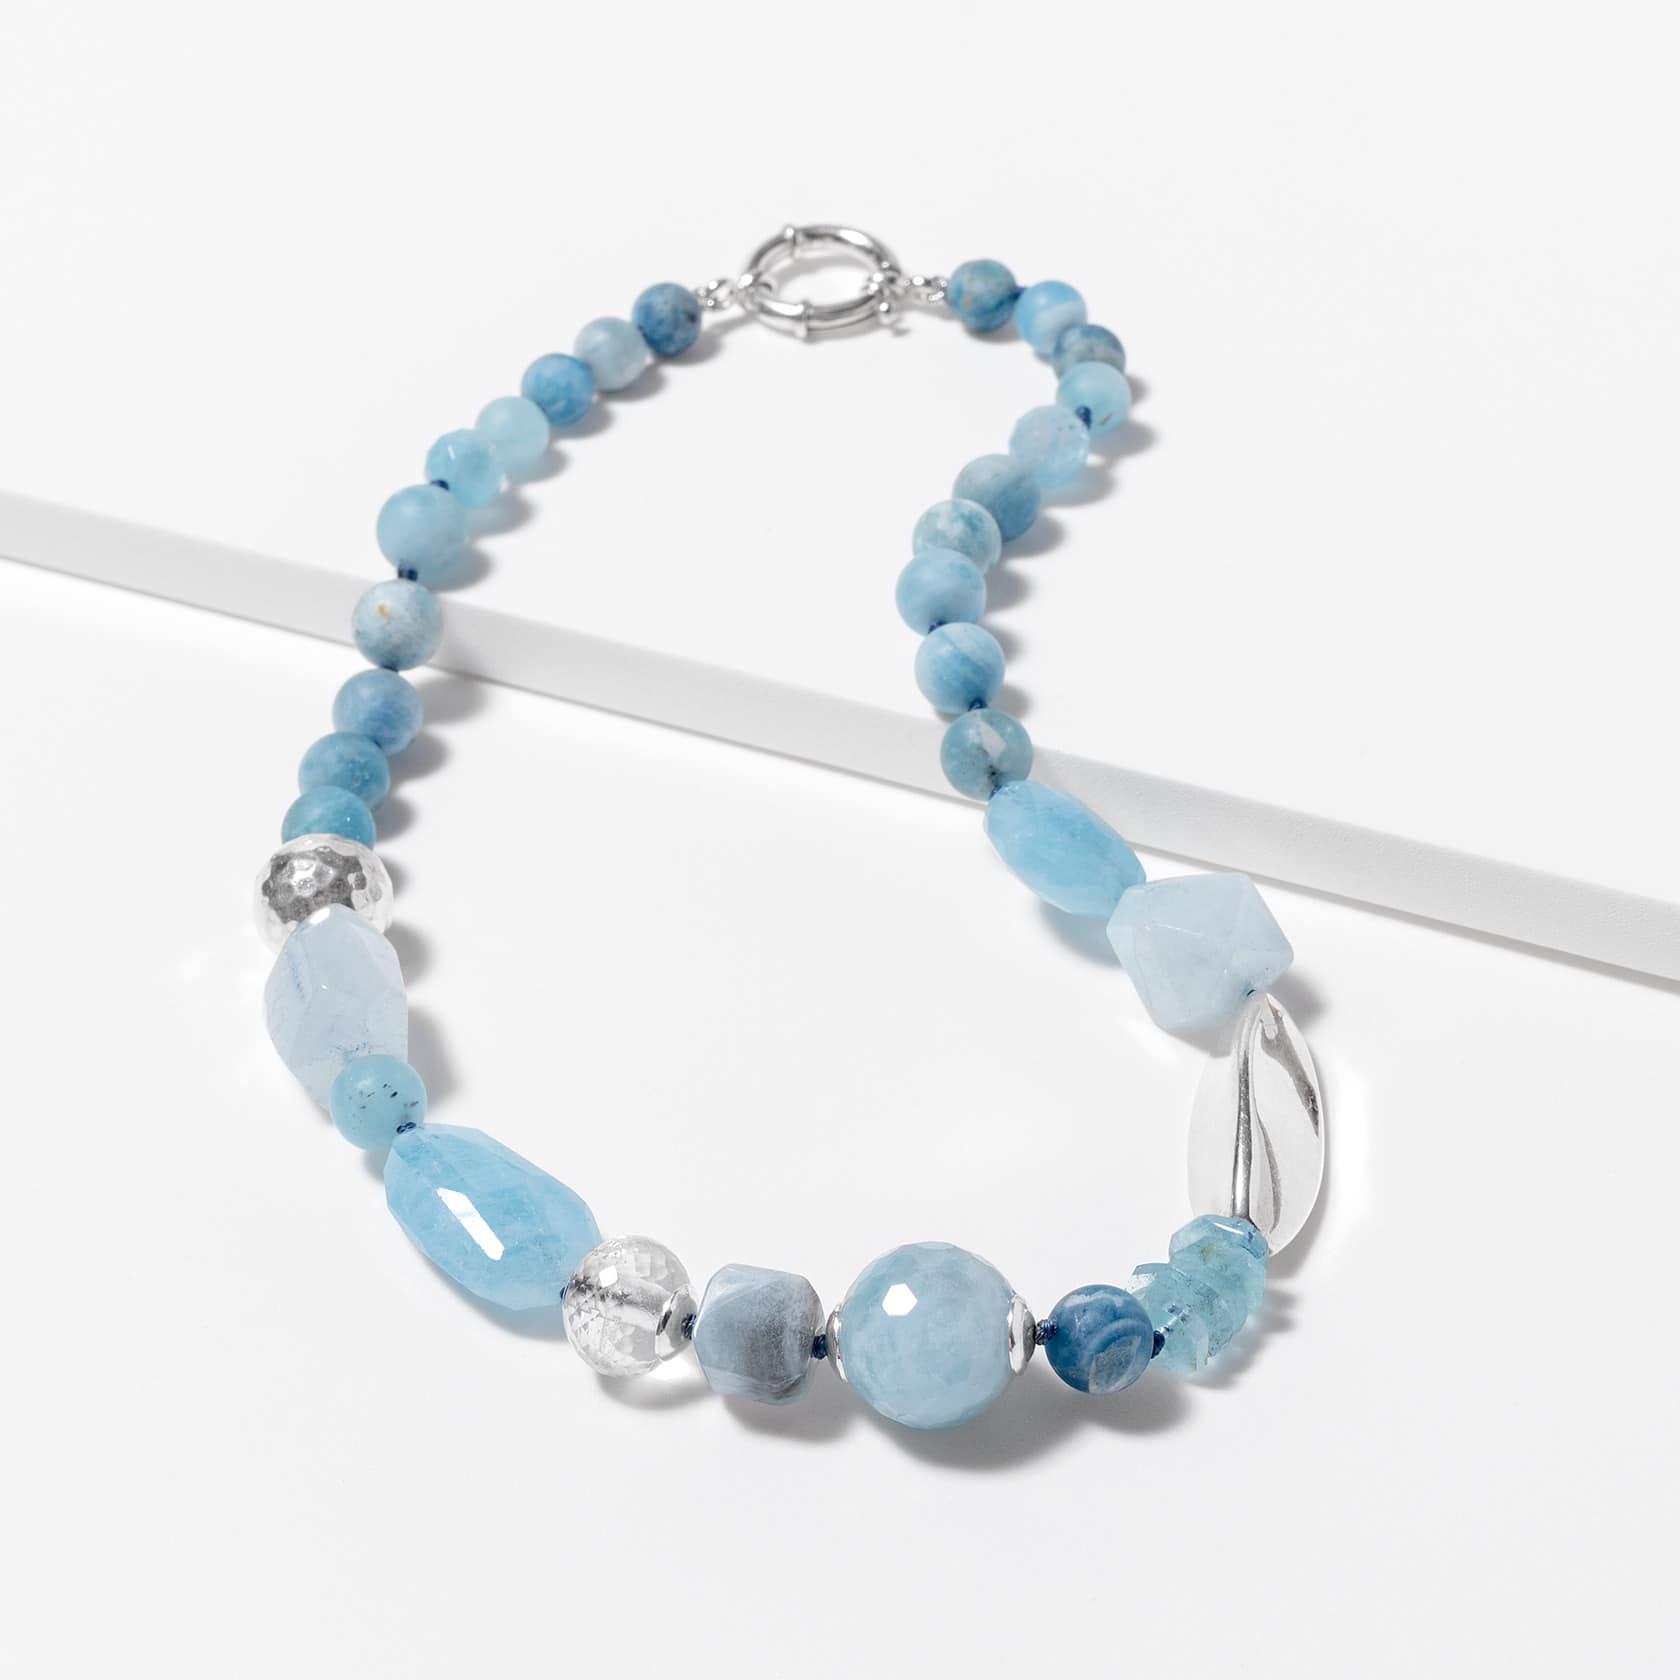 Aquamarine irregular necklace